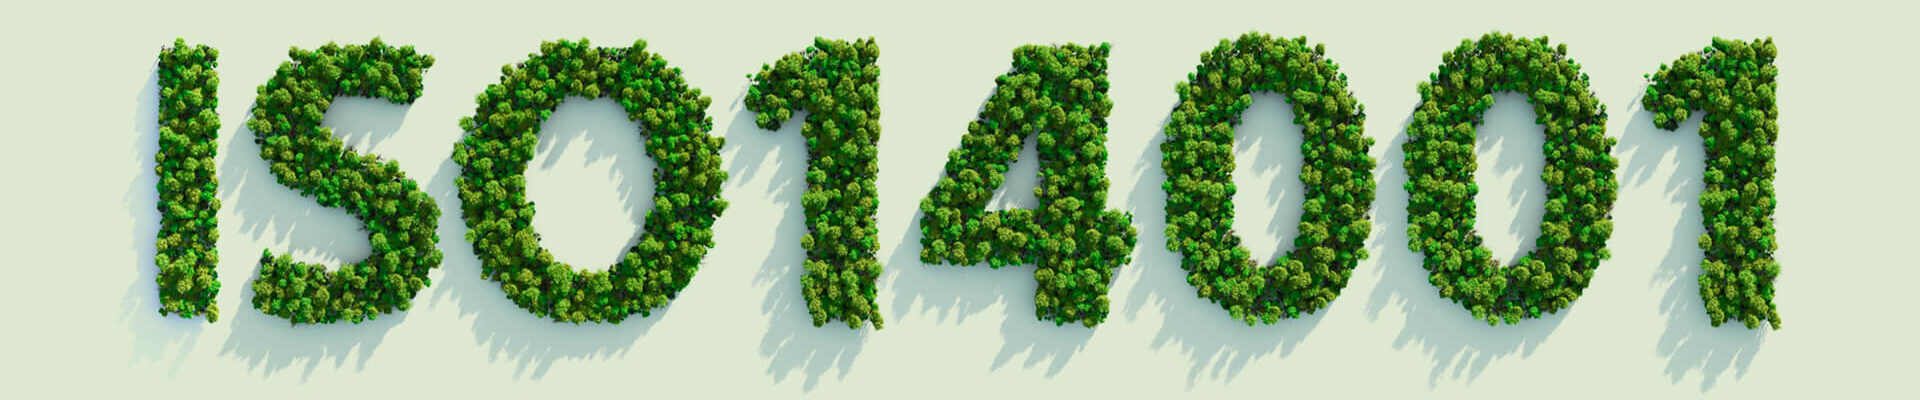 Getting ISO 14001 Certified-ISO 9001 Atlanta GA-ISO PROS#16